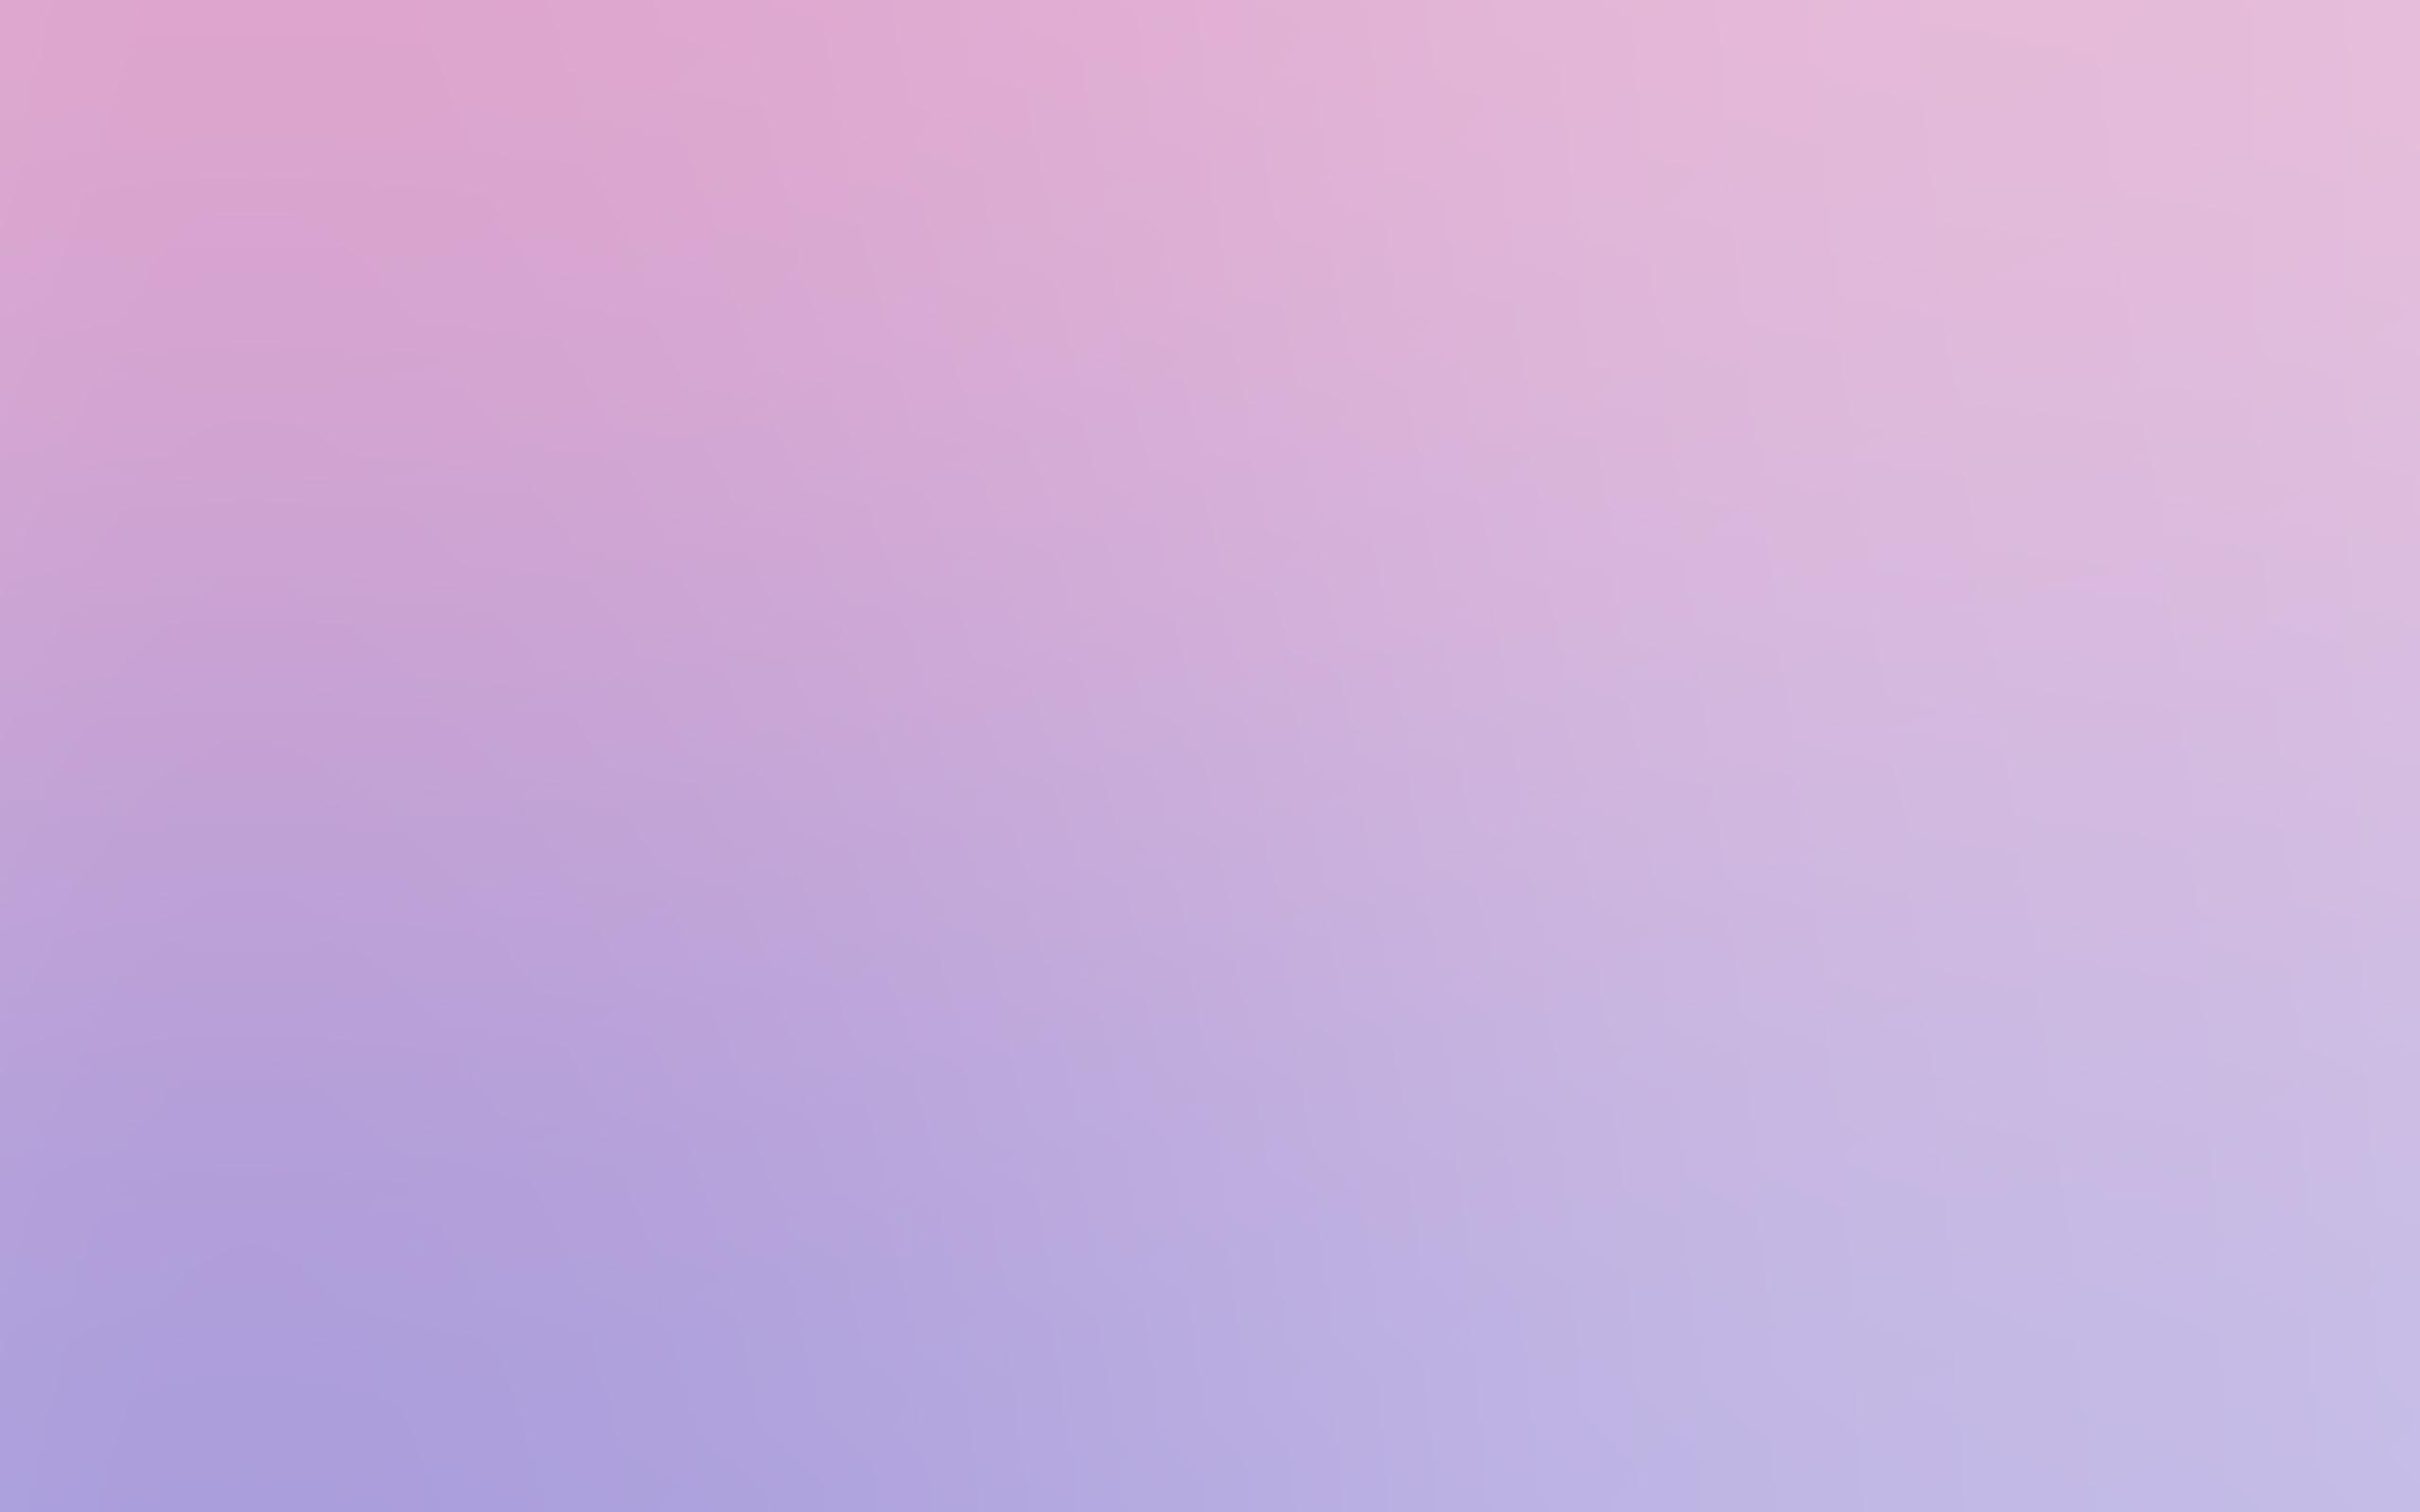 sm33-pink-purple-blur-gradation-wallpaper